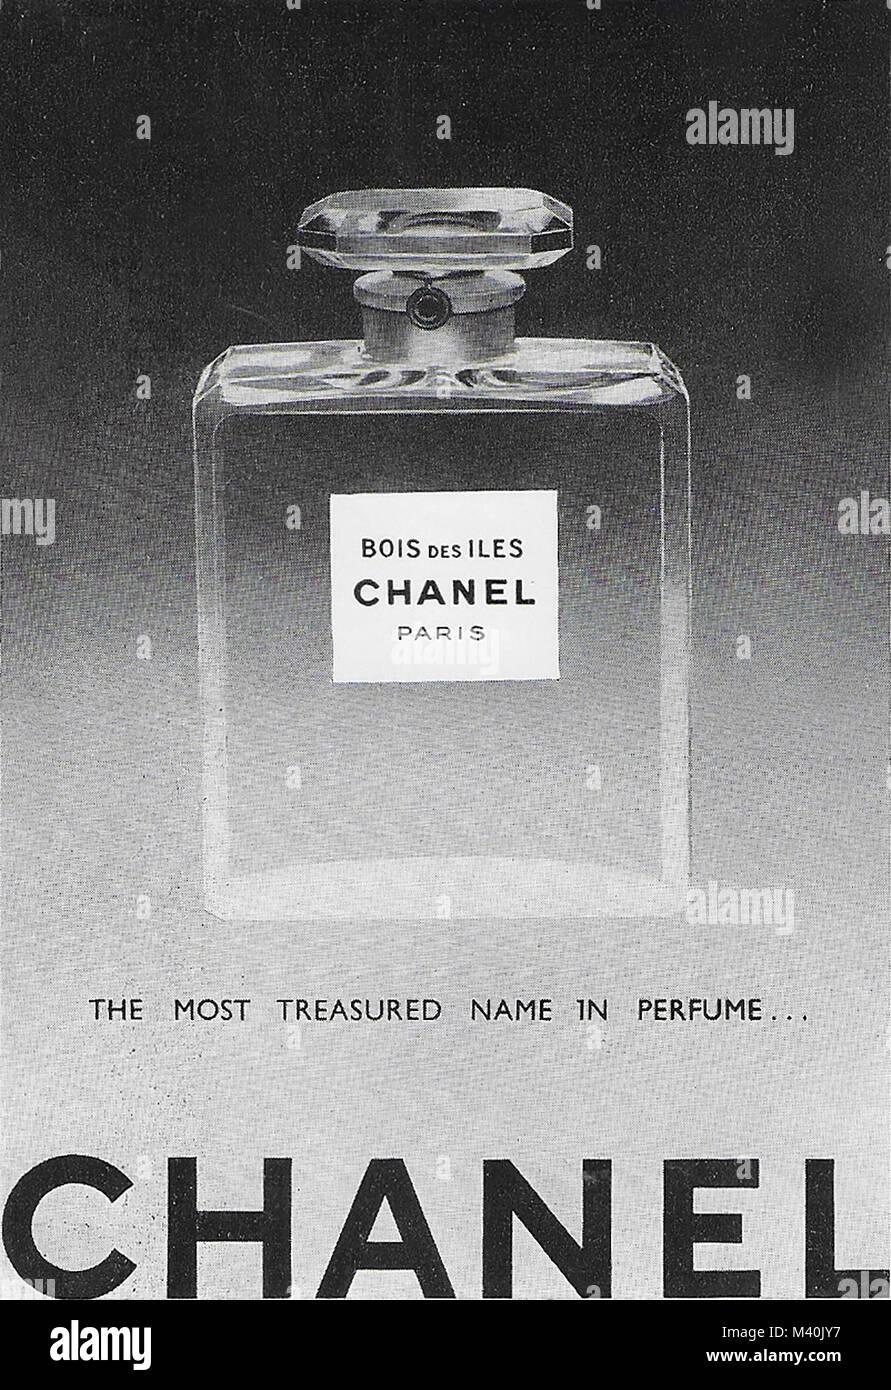 Perfume Advertisements Stock Photos Perfume Advertisements Stock